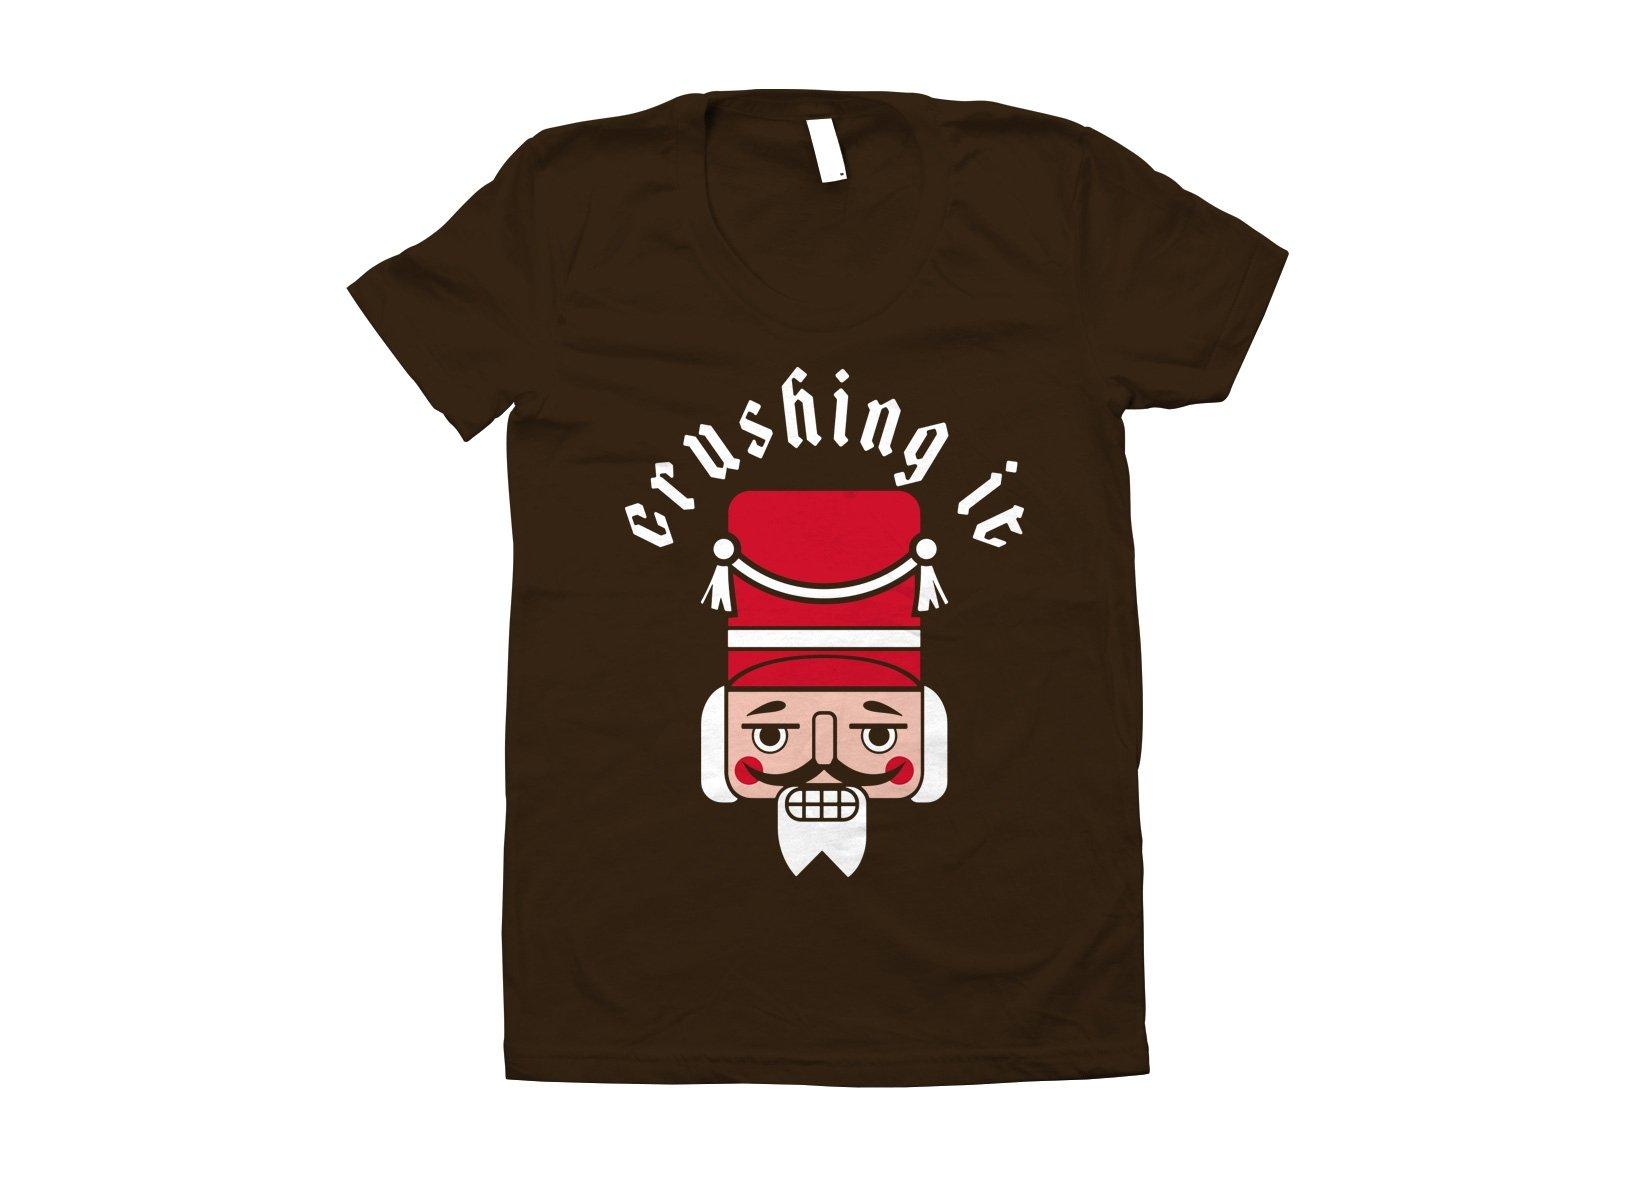 Crushing It on Juniors T-Shirt